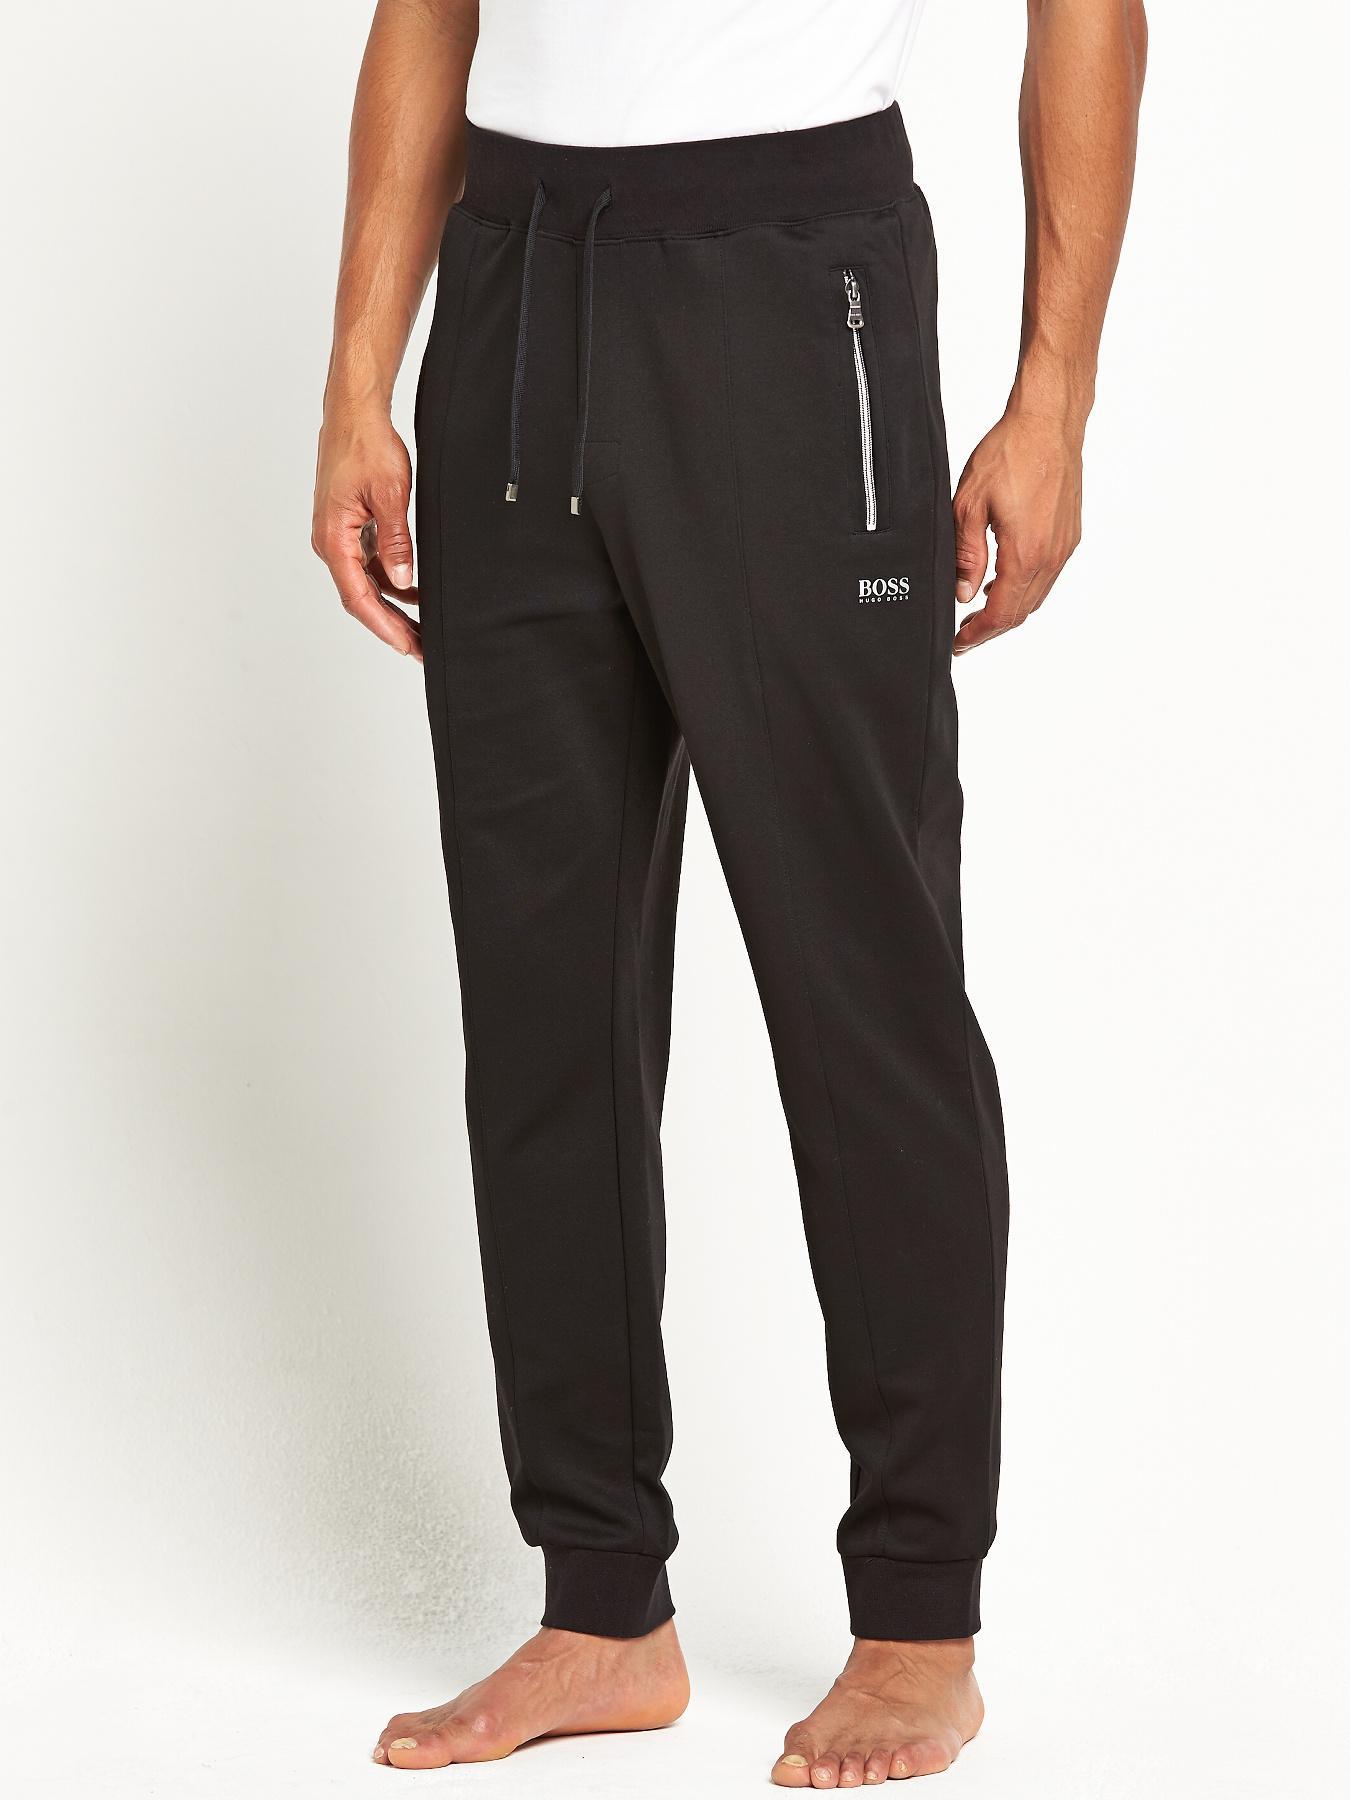 Hugo Boss Mens Cuffed Pants - Black, Black